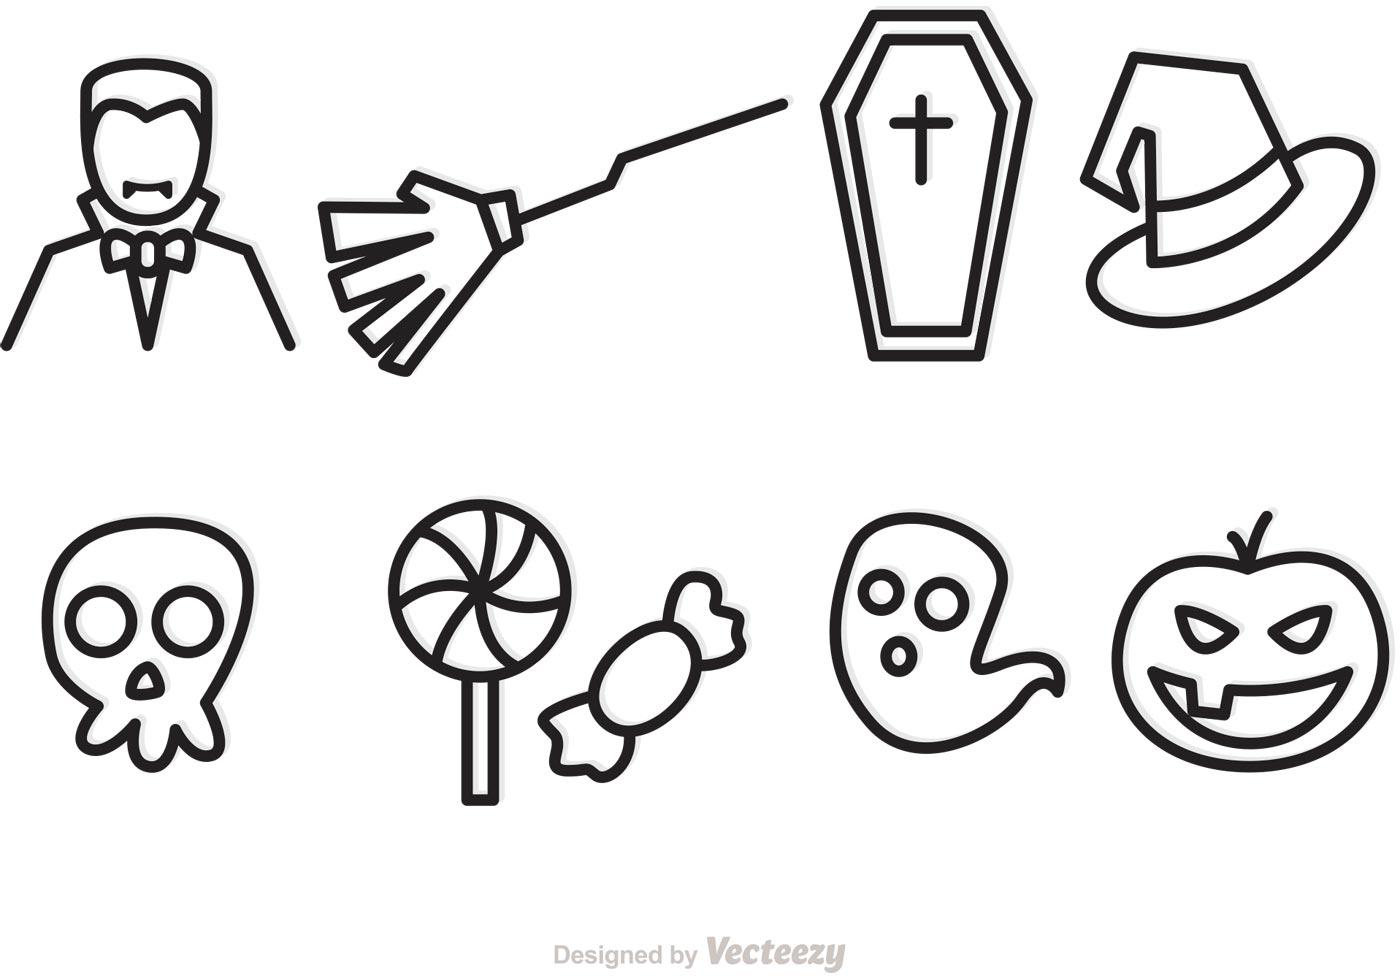 halloween outline vector icons - download free vector art, stock